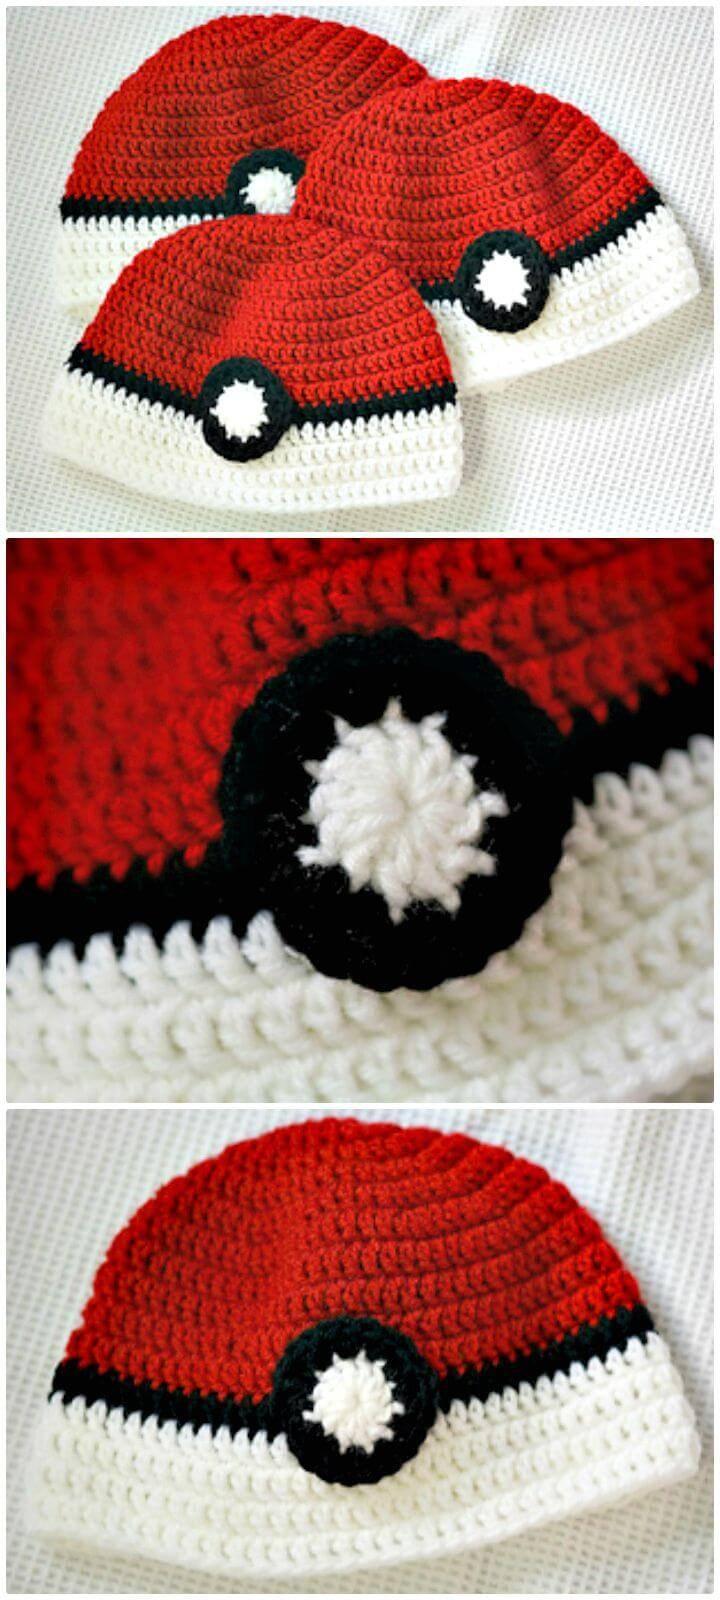 Easy How To Free Crochet Poke'ball Hat Pattern